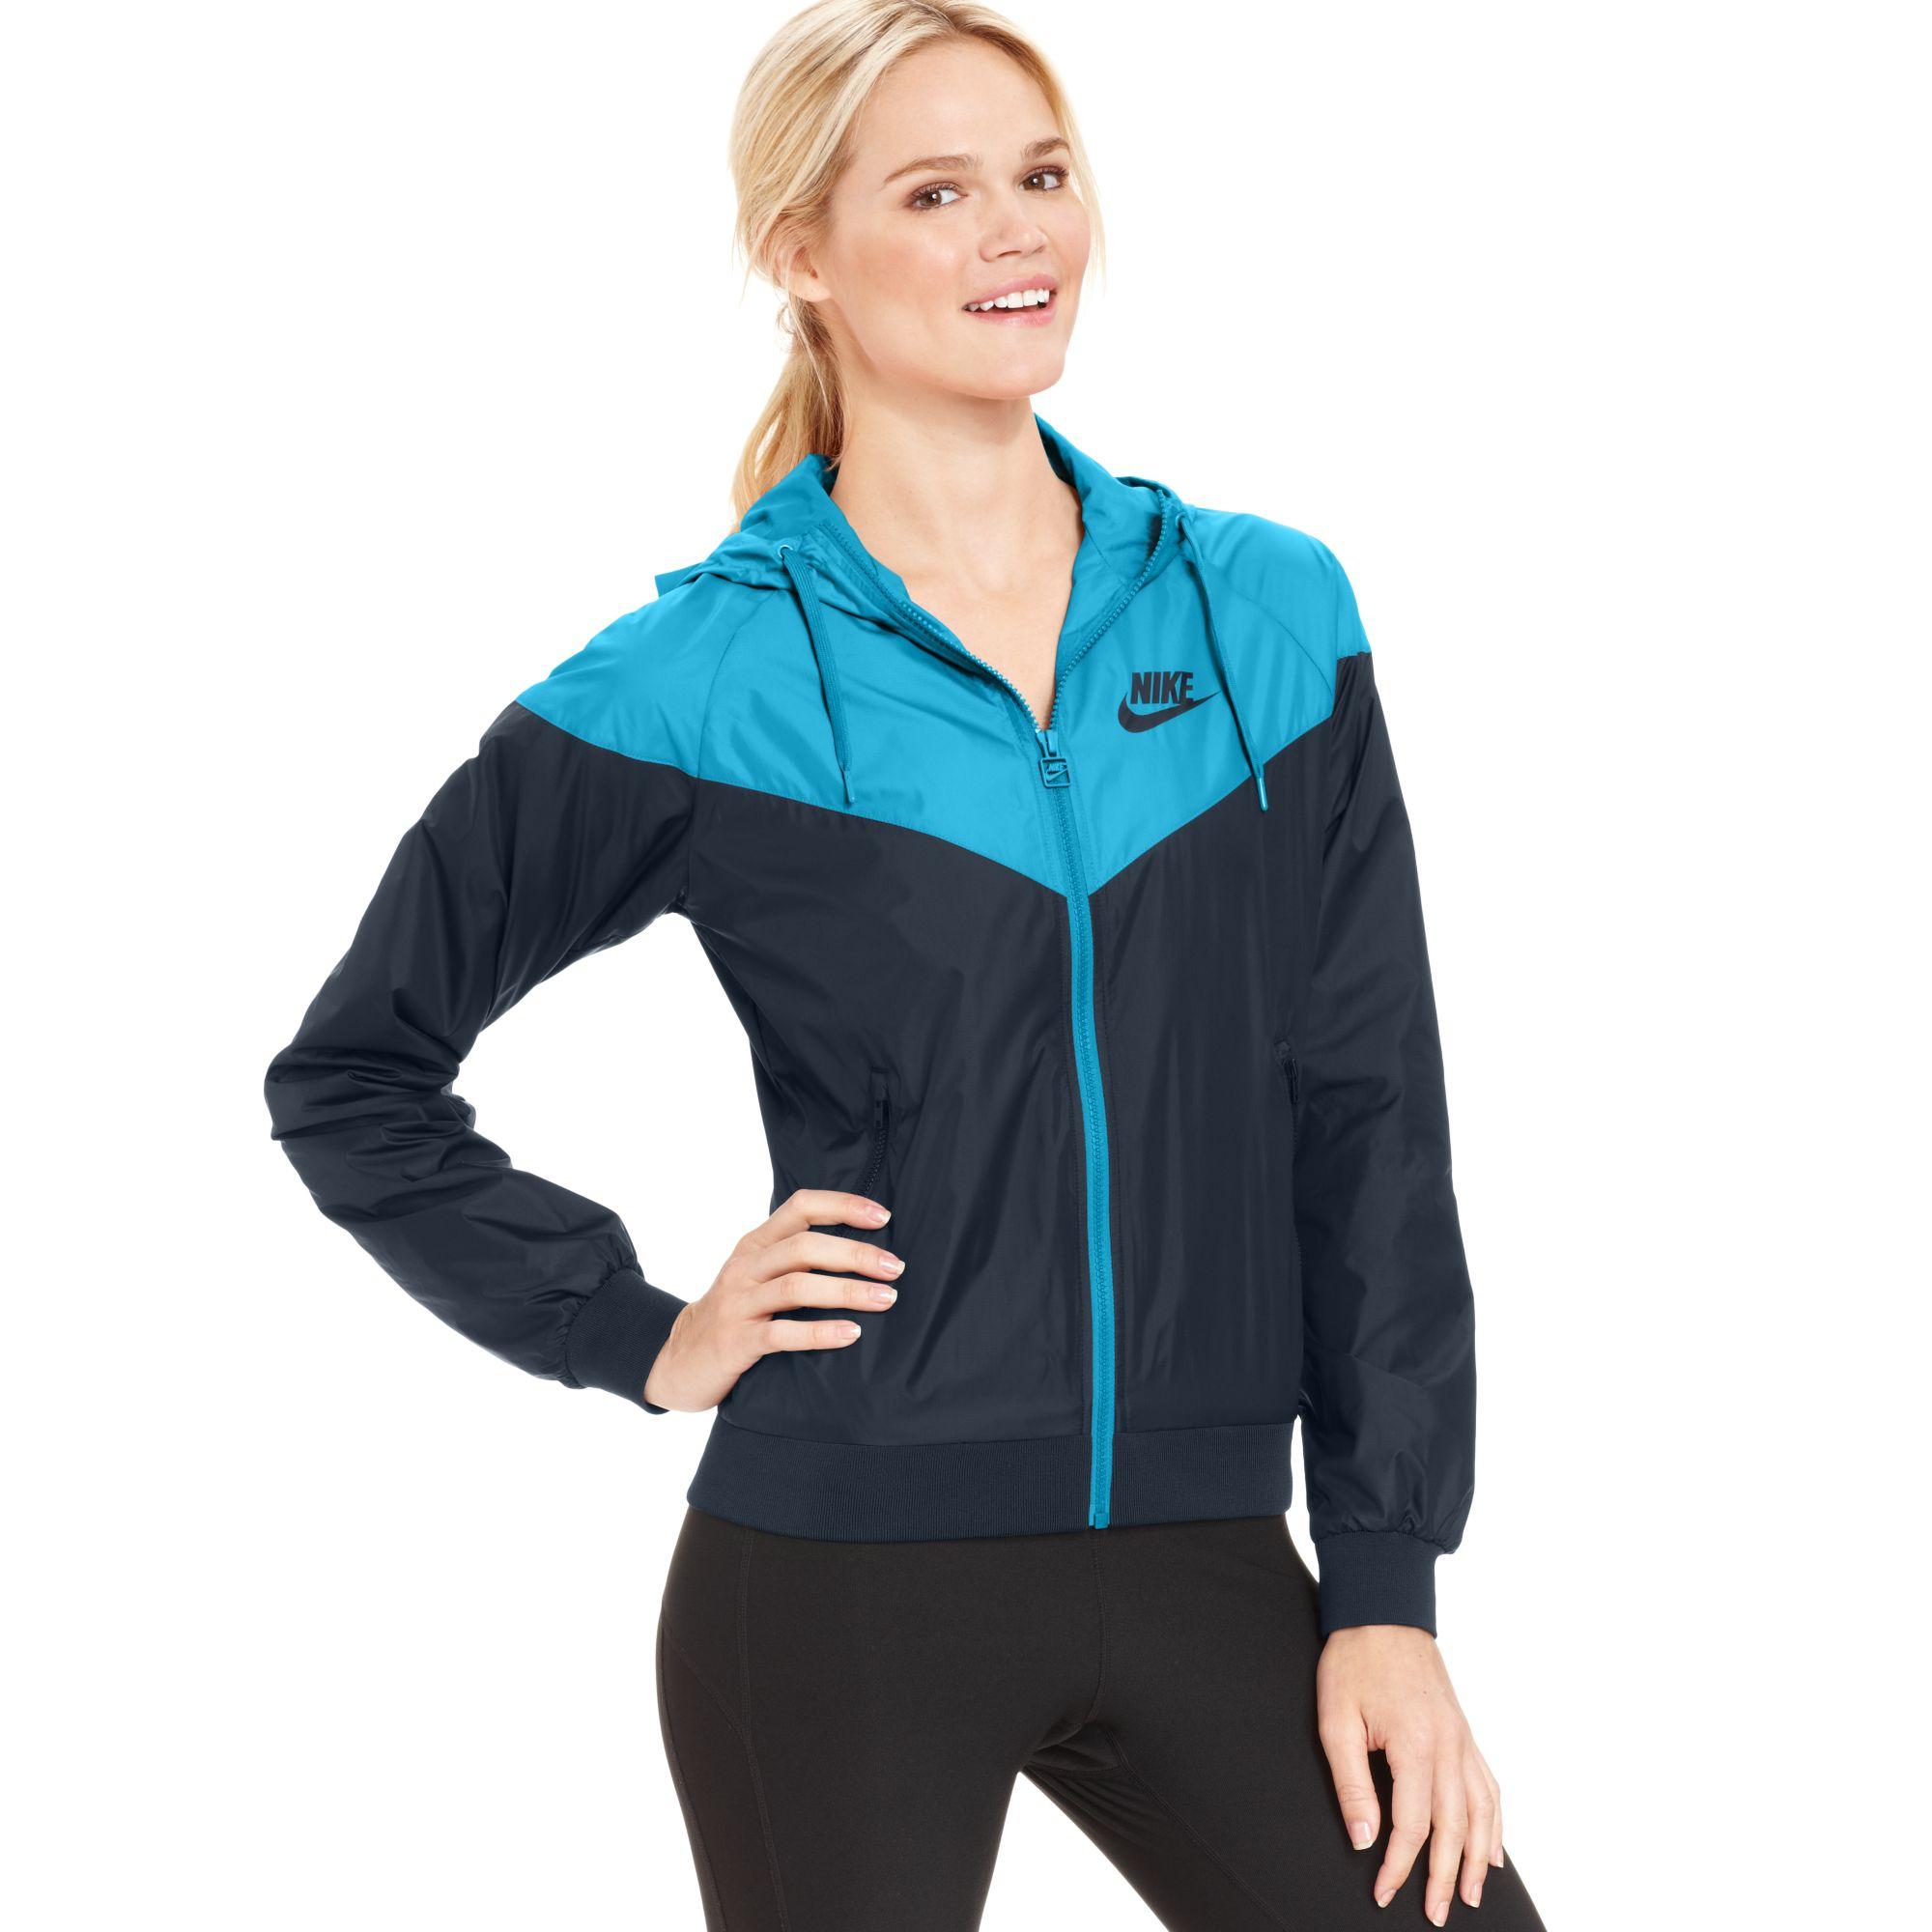 42e57474b008b Nike Colorblocked Hooded Windrunner Jacket in Blue - Lyst